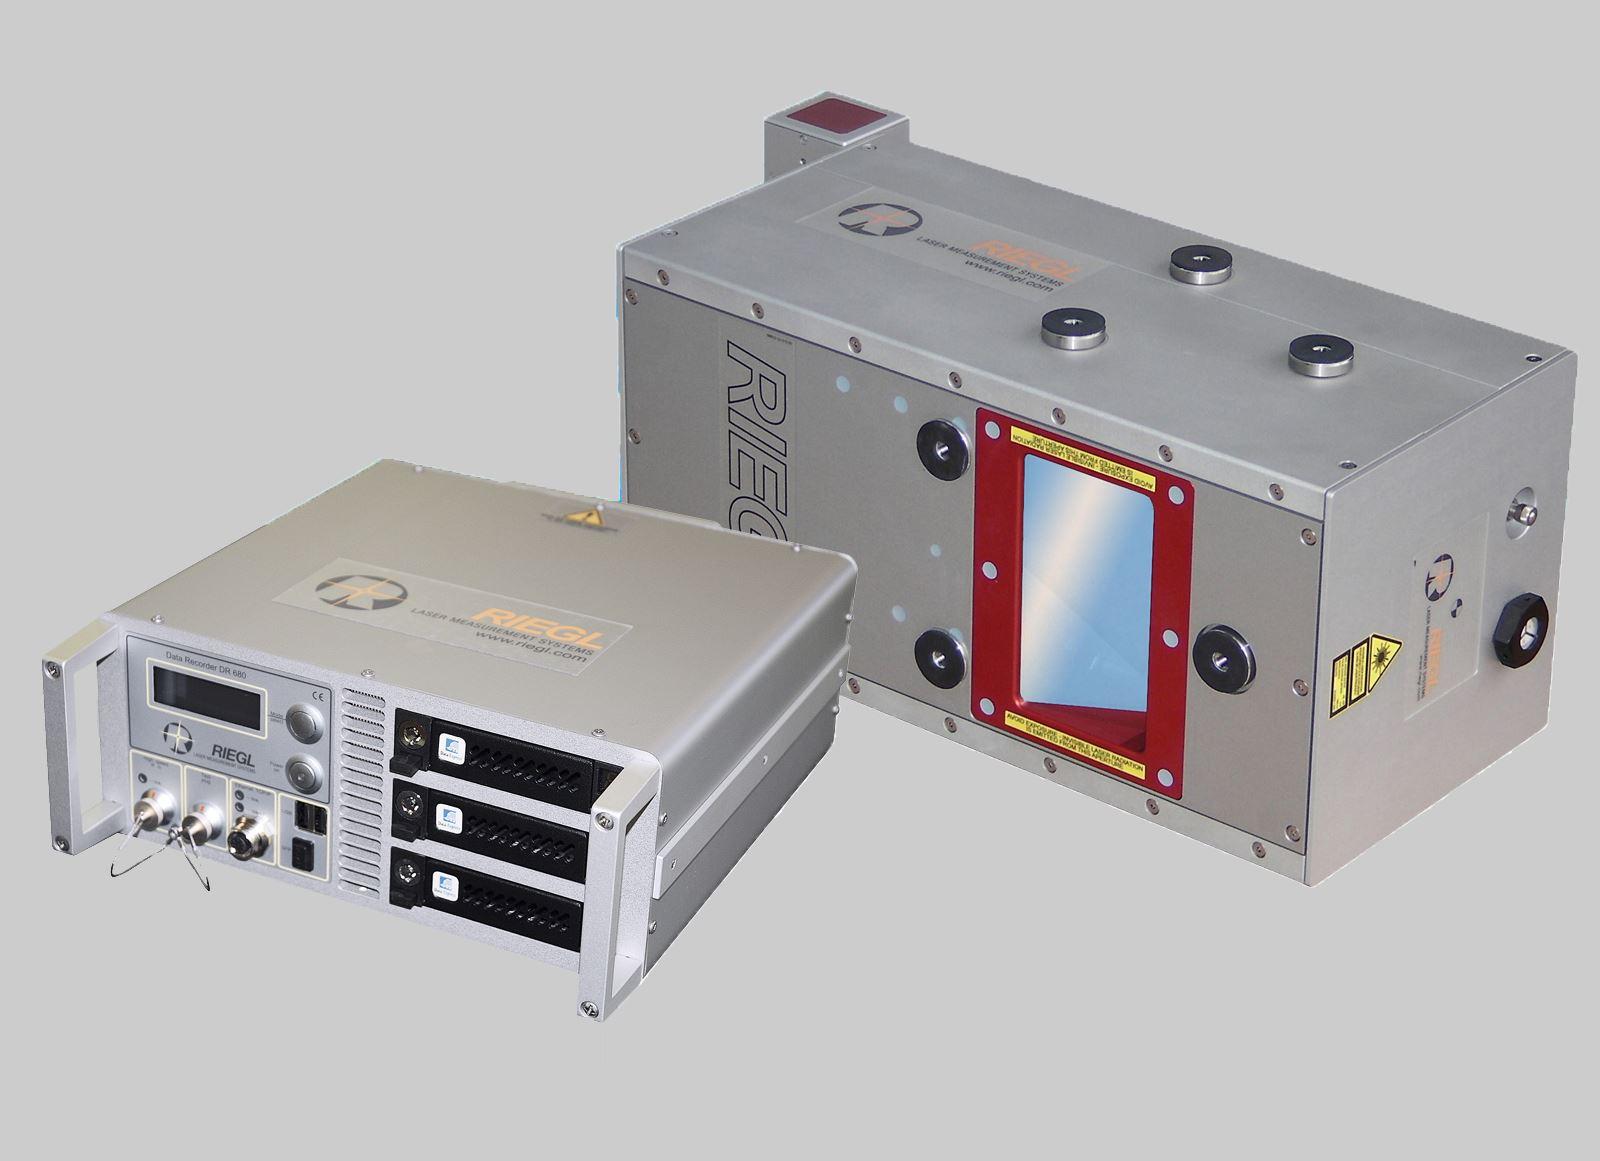 RIEGL LMS Q680i